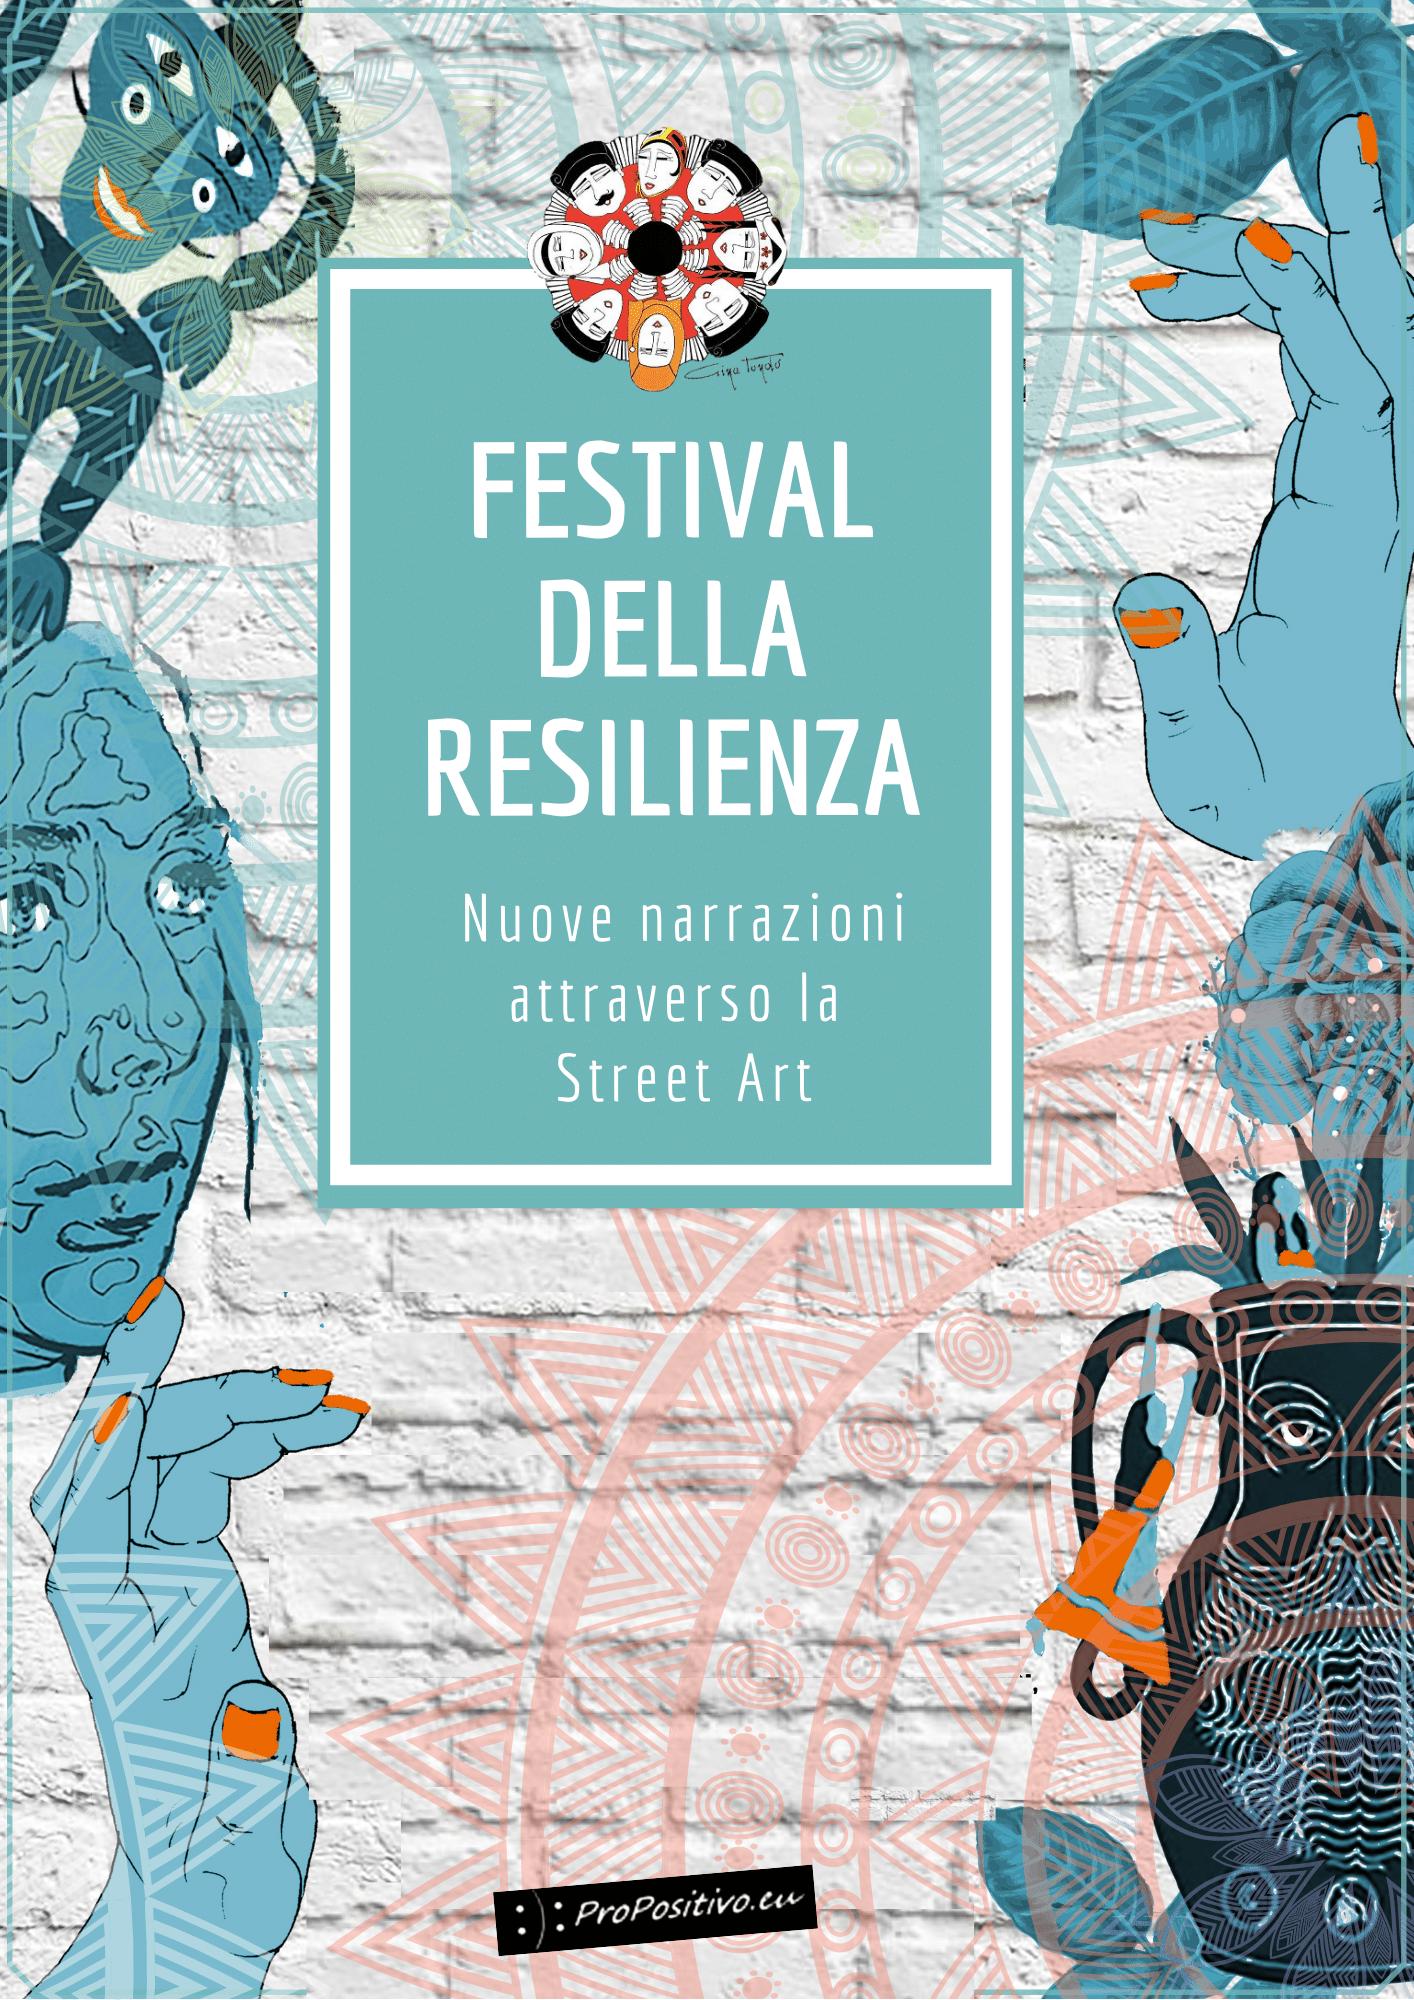 catalogo murales street art macomer sardegna festival resilienza propositivo1